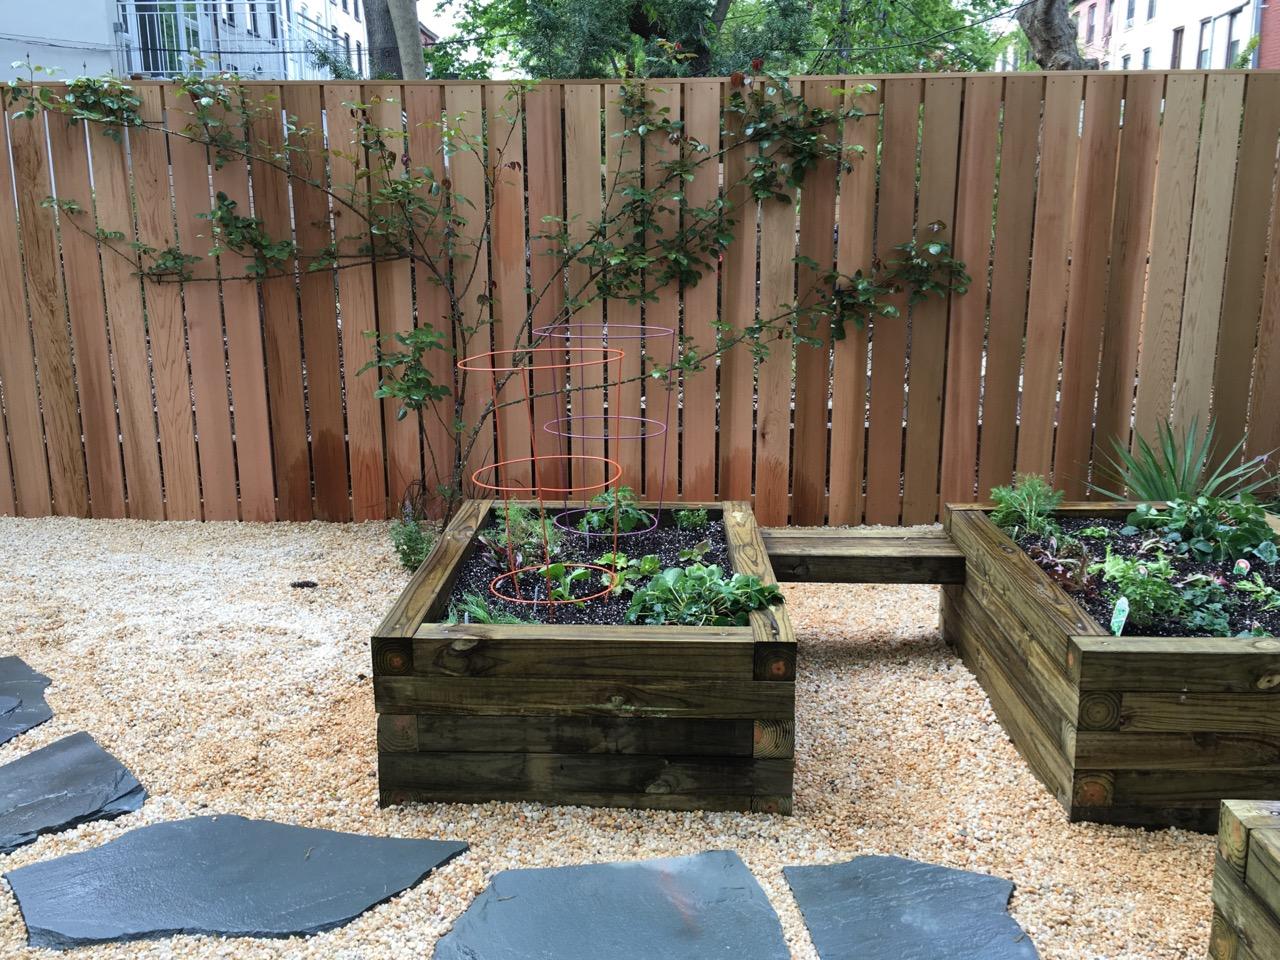 custom-planters-fence-st-james2-by-edible-petals-brooklyn.jpg